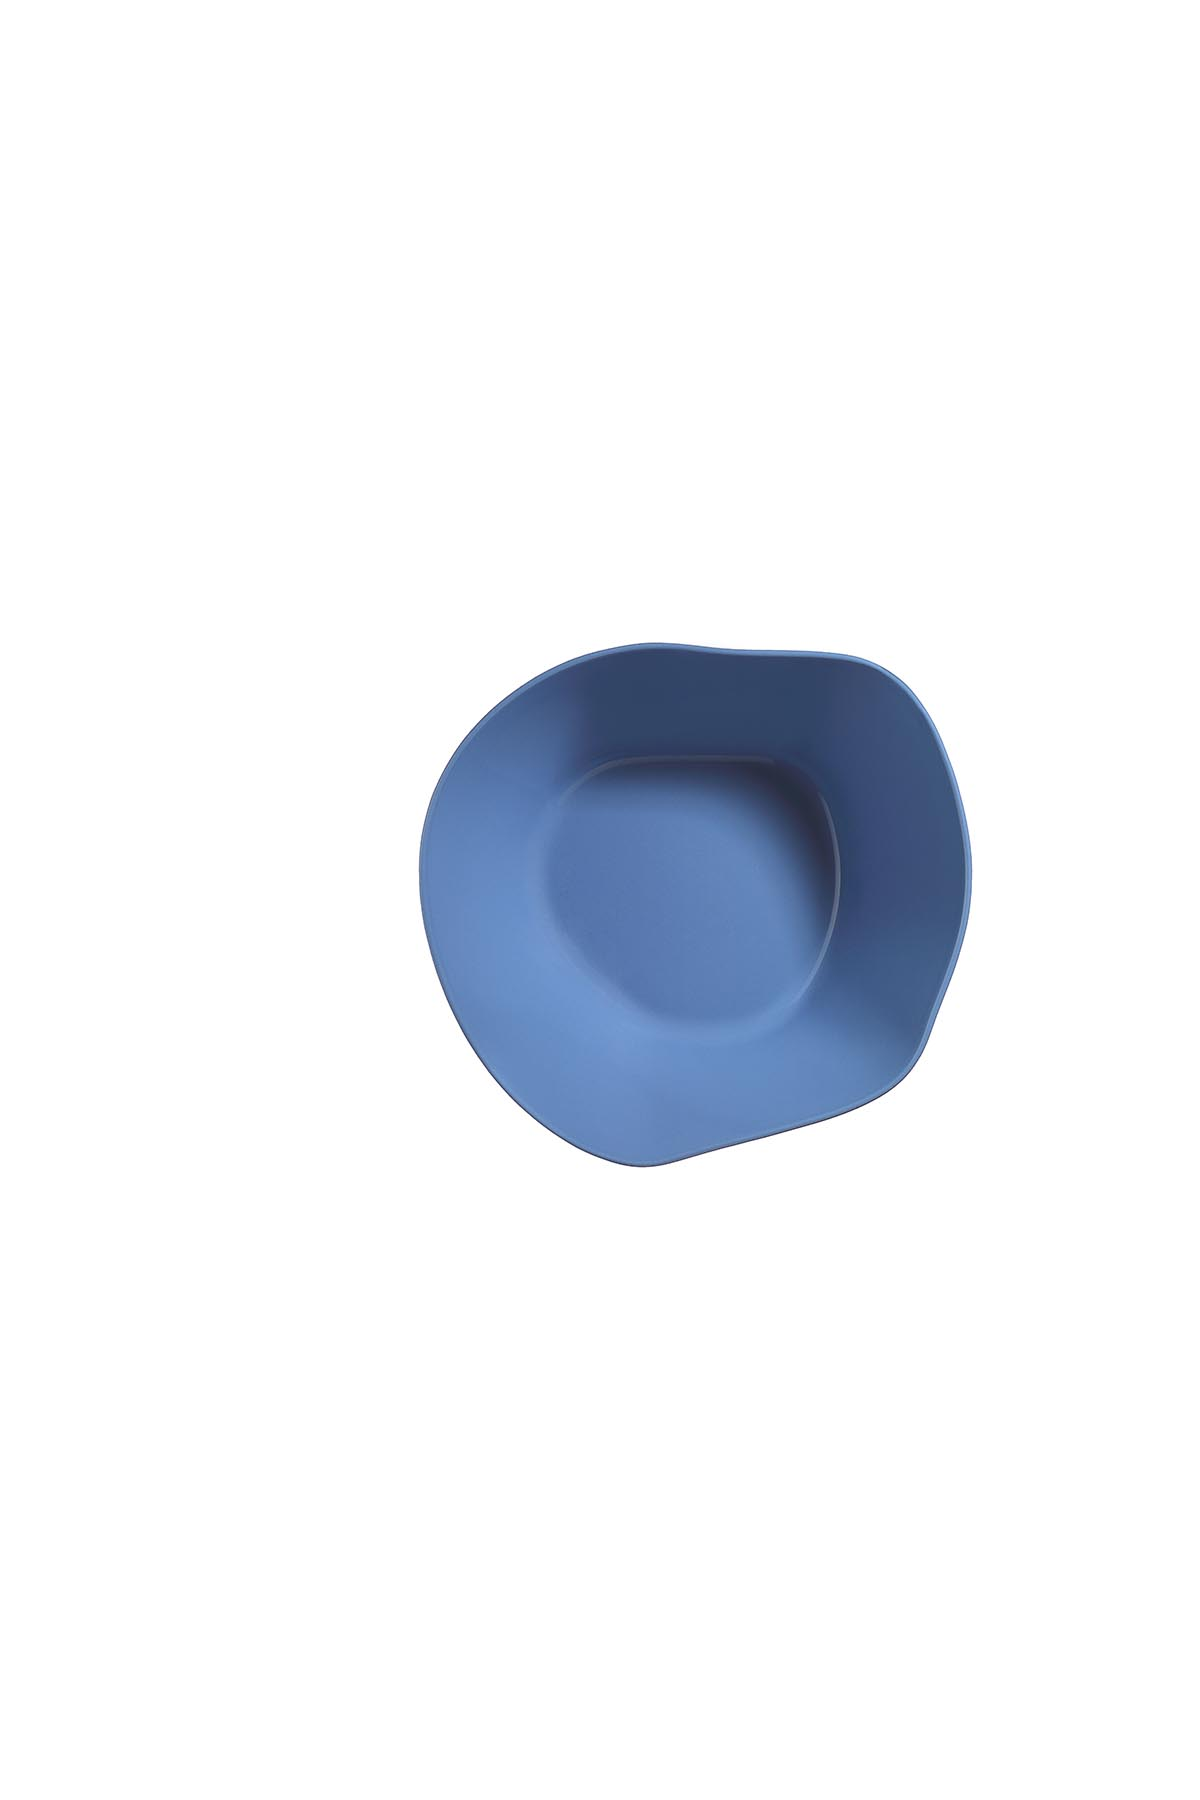 Kütahya Porselen Skallop 2'li 23 cm Büyük Kase Seti Mavi